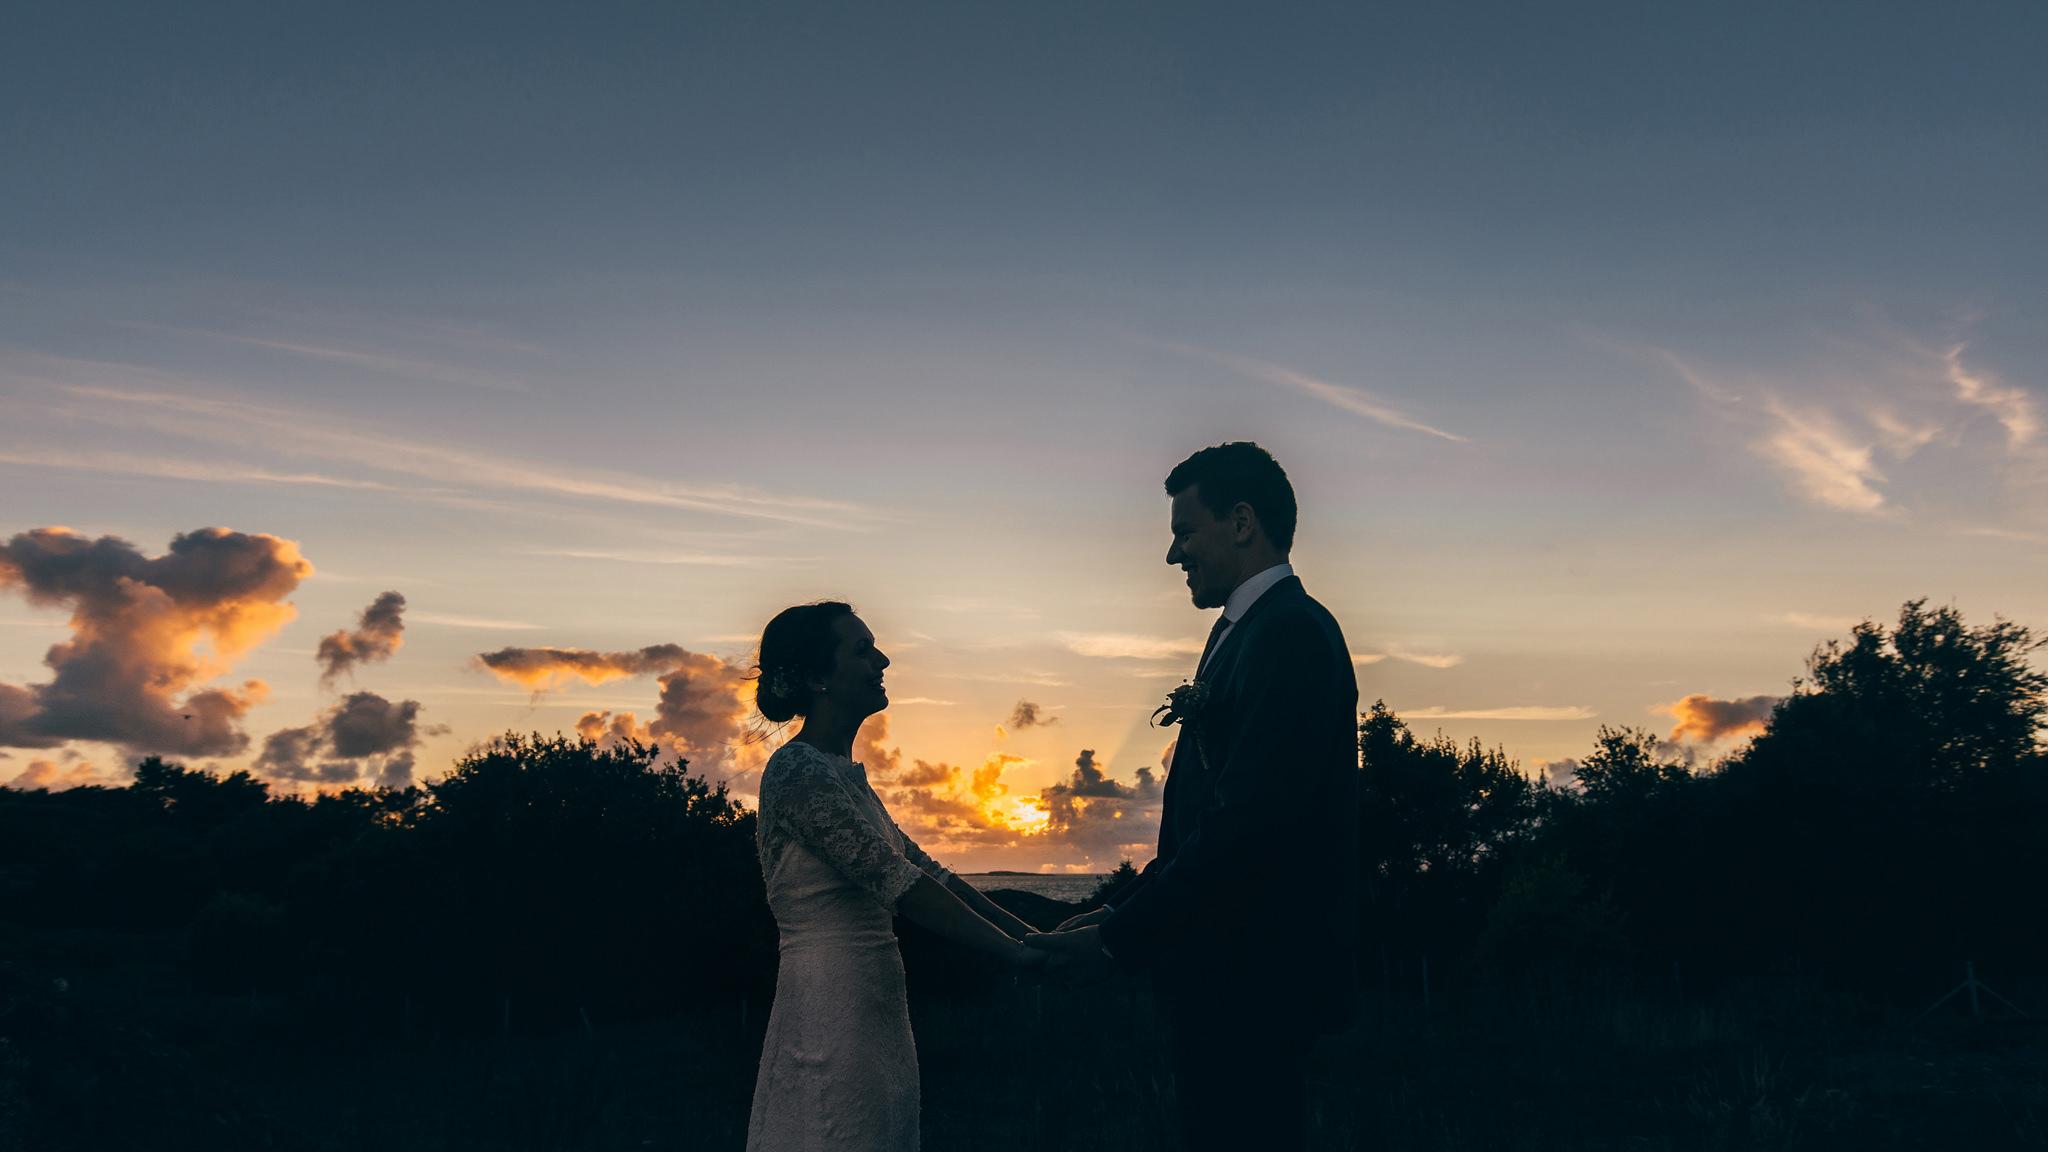 Norway+wedding+photographer+elopement+pre+wedding+Casey+Arneson-124.jpg